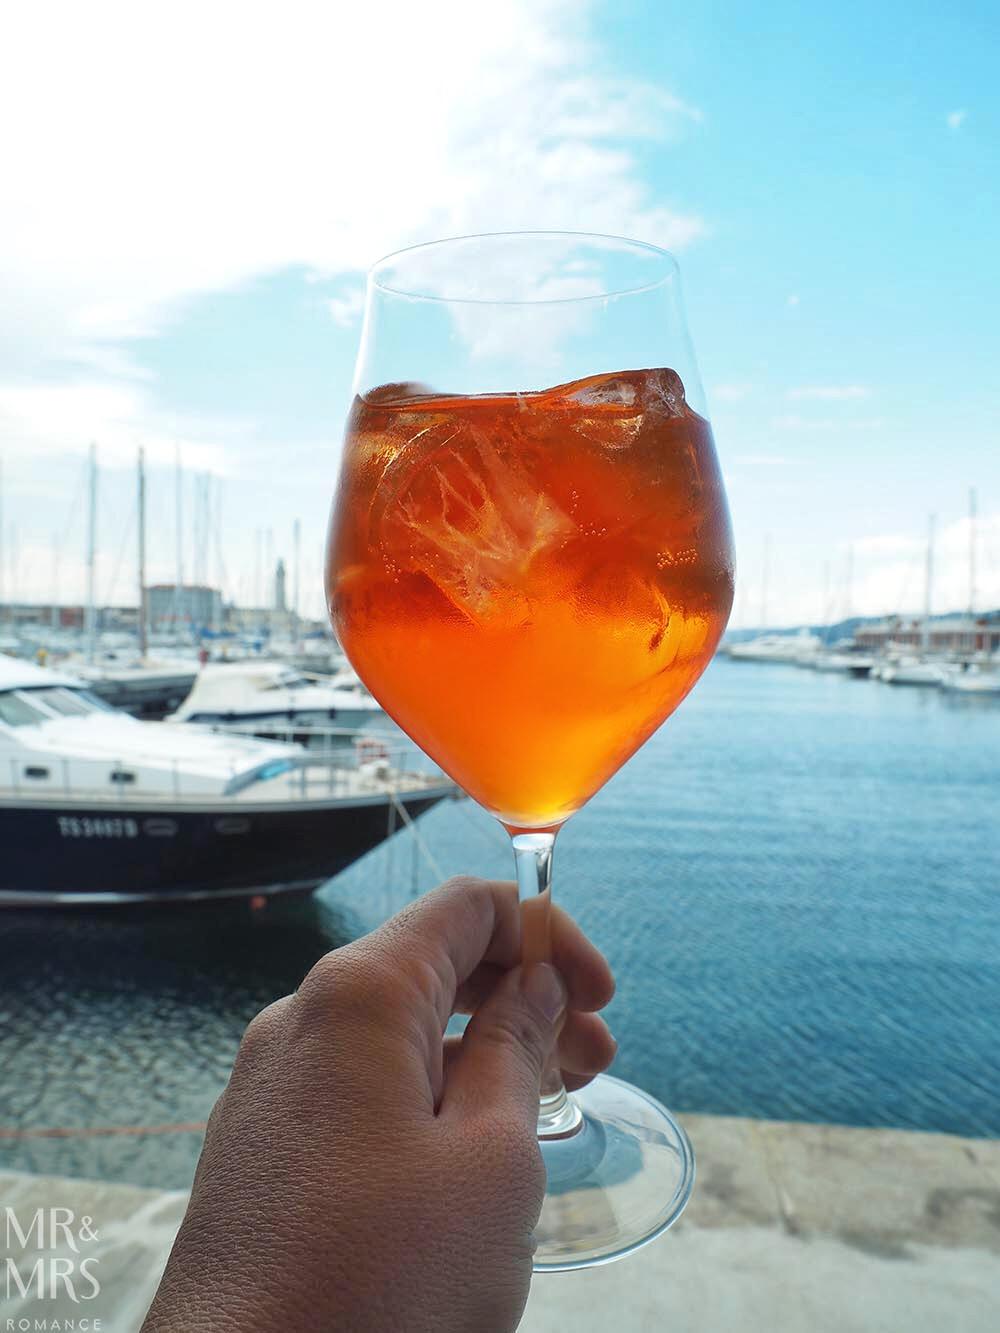 Trieste guide - spritz Eataly